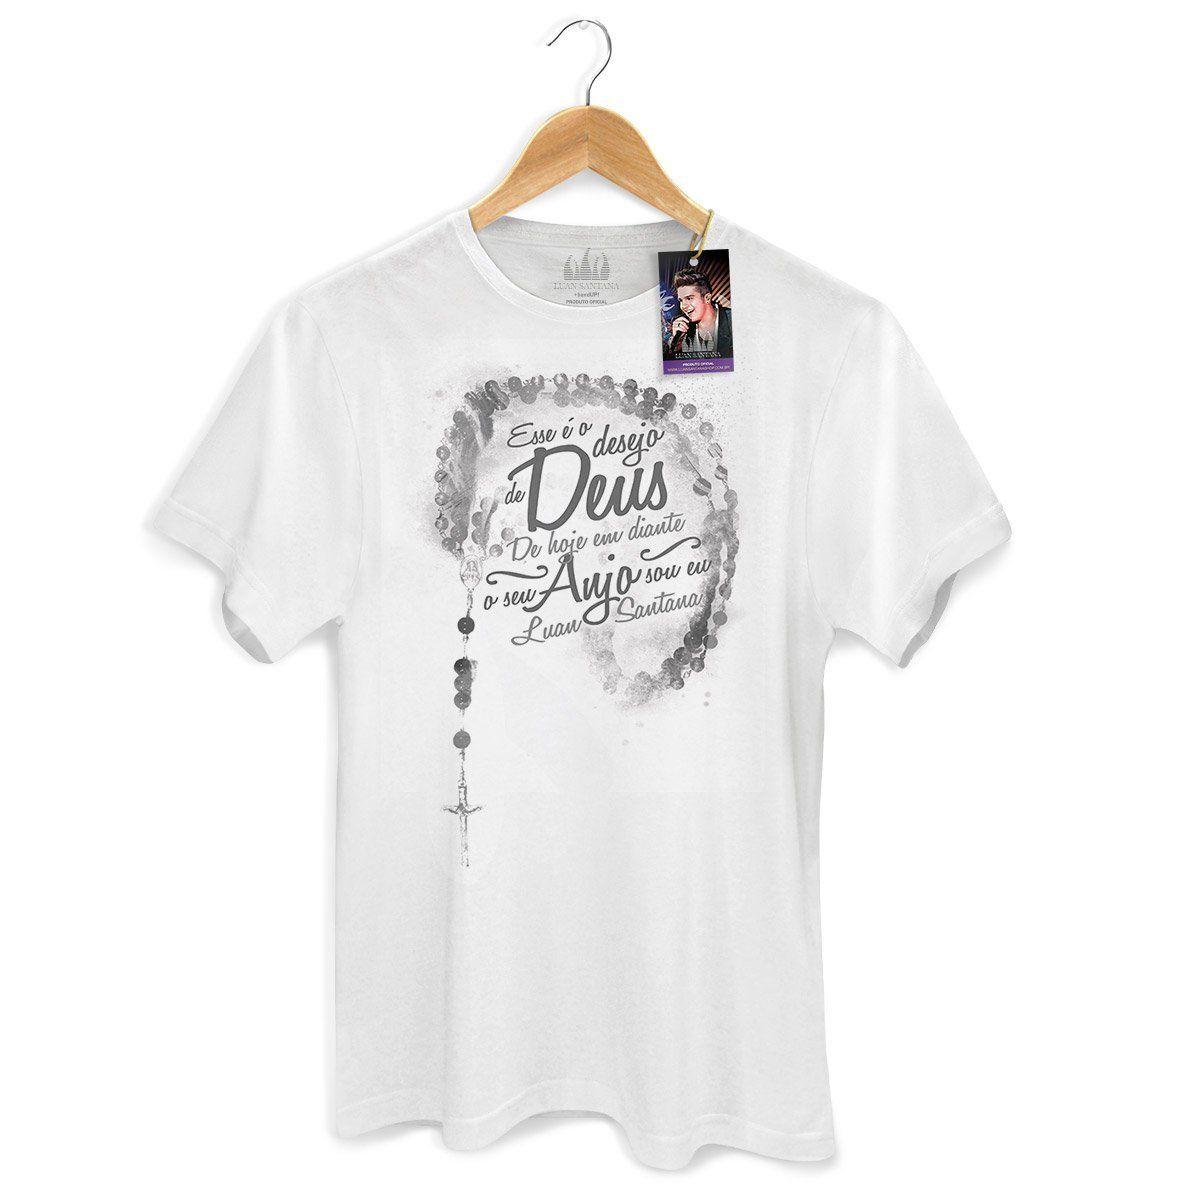 Camiseta Masculina Luan Santana - Mais Que Amigos  - bandUP Store Marketplace